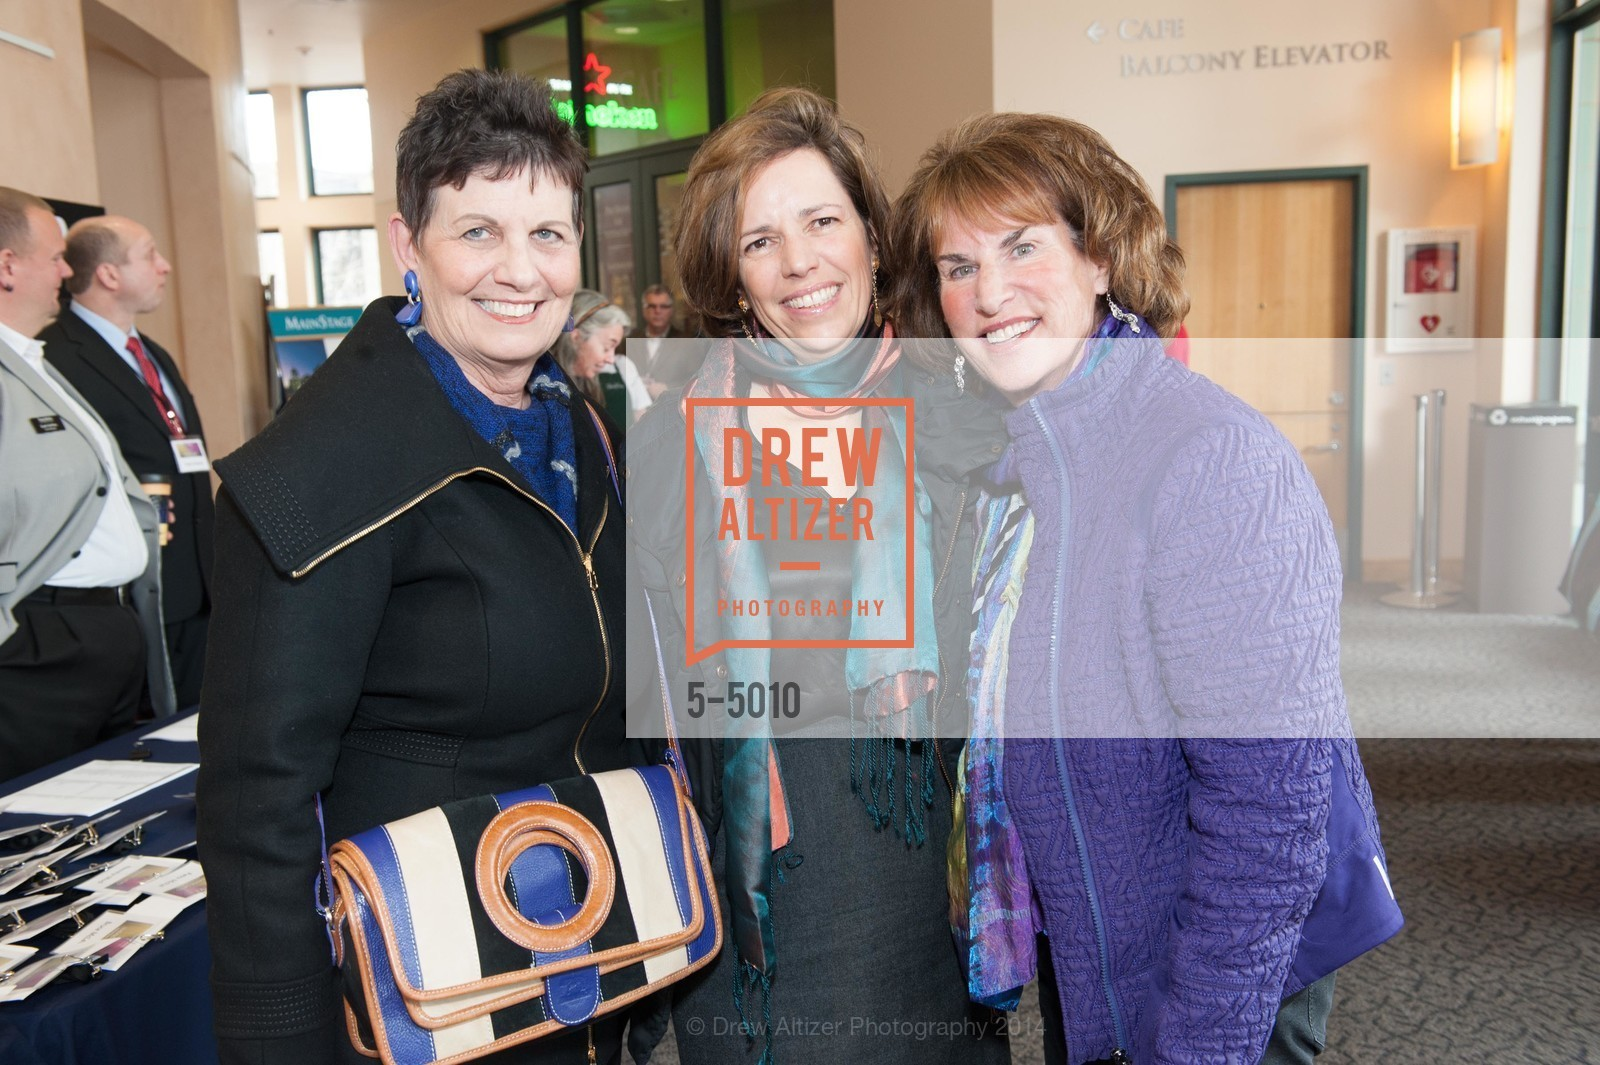 Michelle Kwatinetz, Mariangela Smania, Cindy Jones, Photo #5-5010